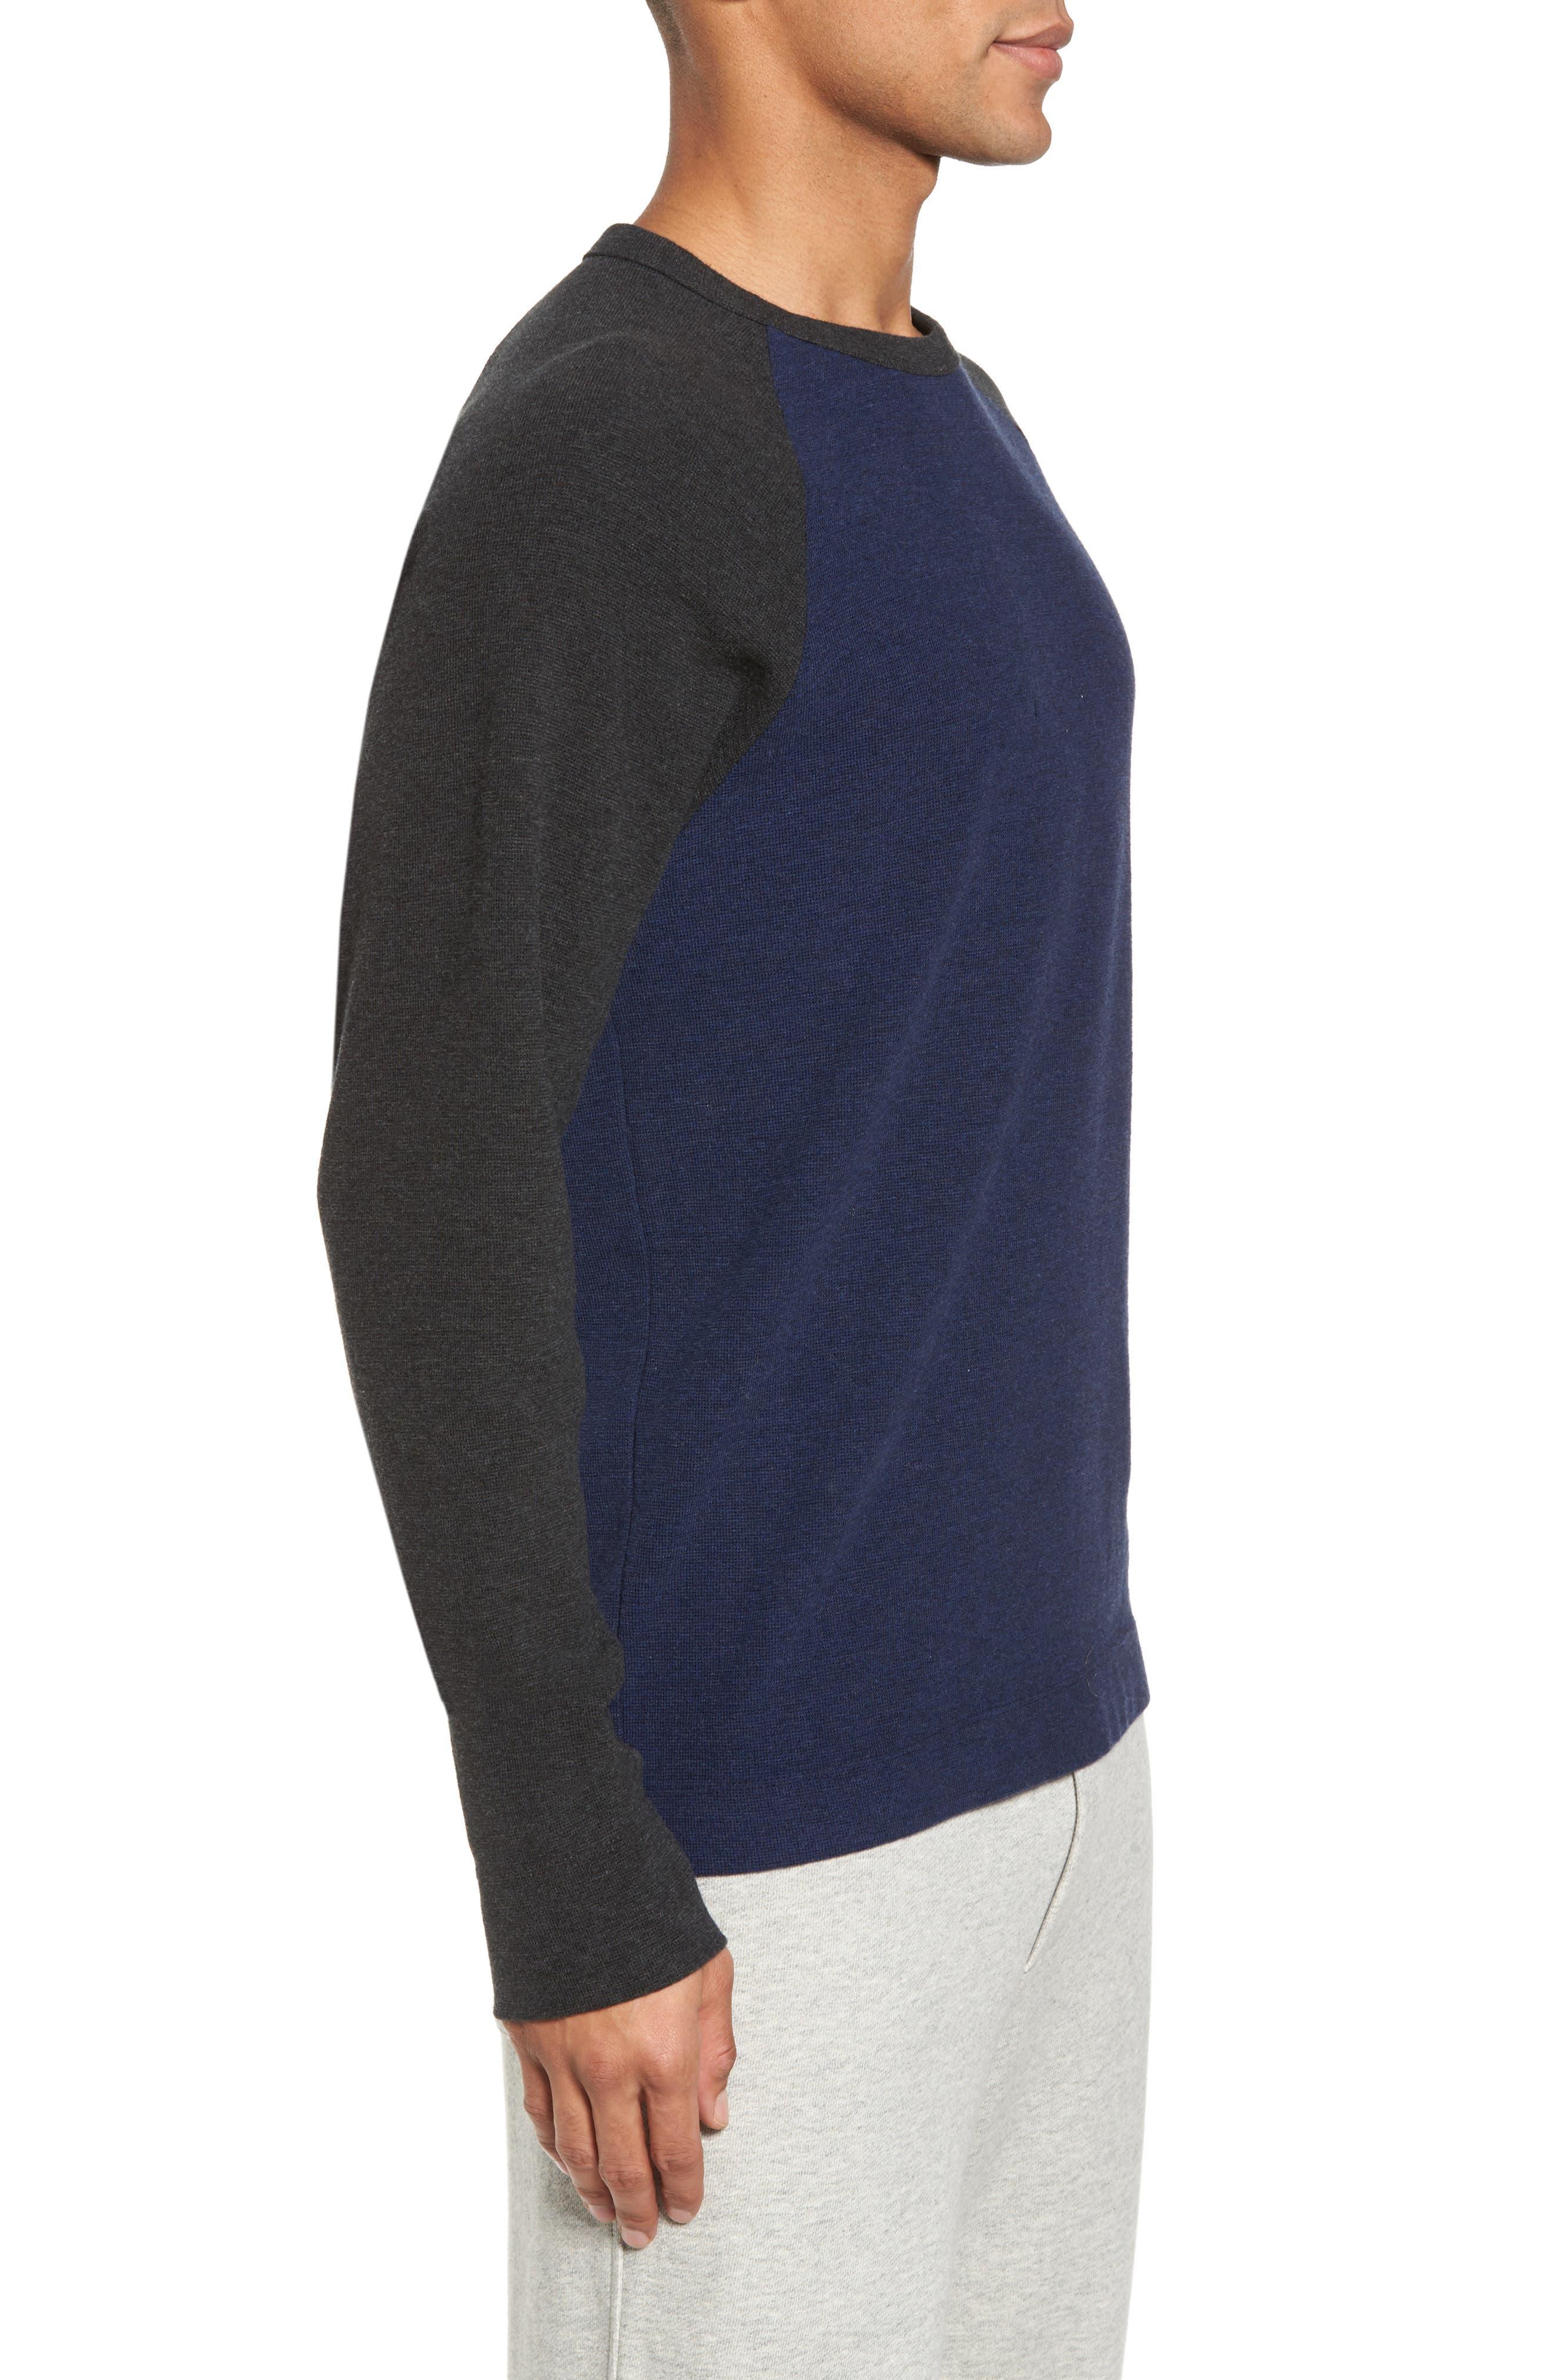 Thermal Knit Raglan Sweatshirt,                             Alternate thumbnail 3, color,                             Heather Navy/ Heather Charcoal